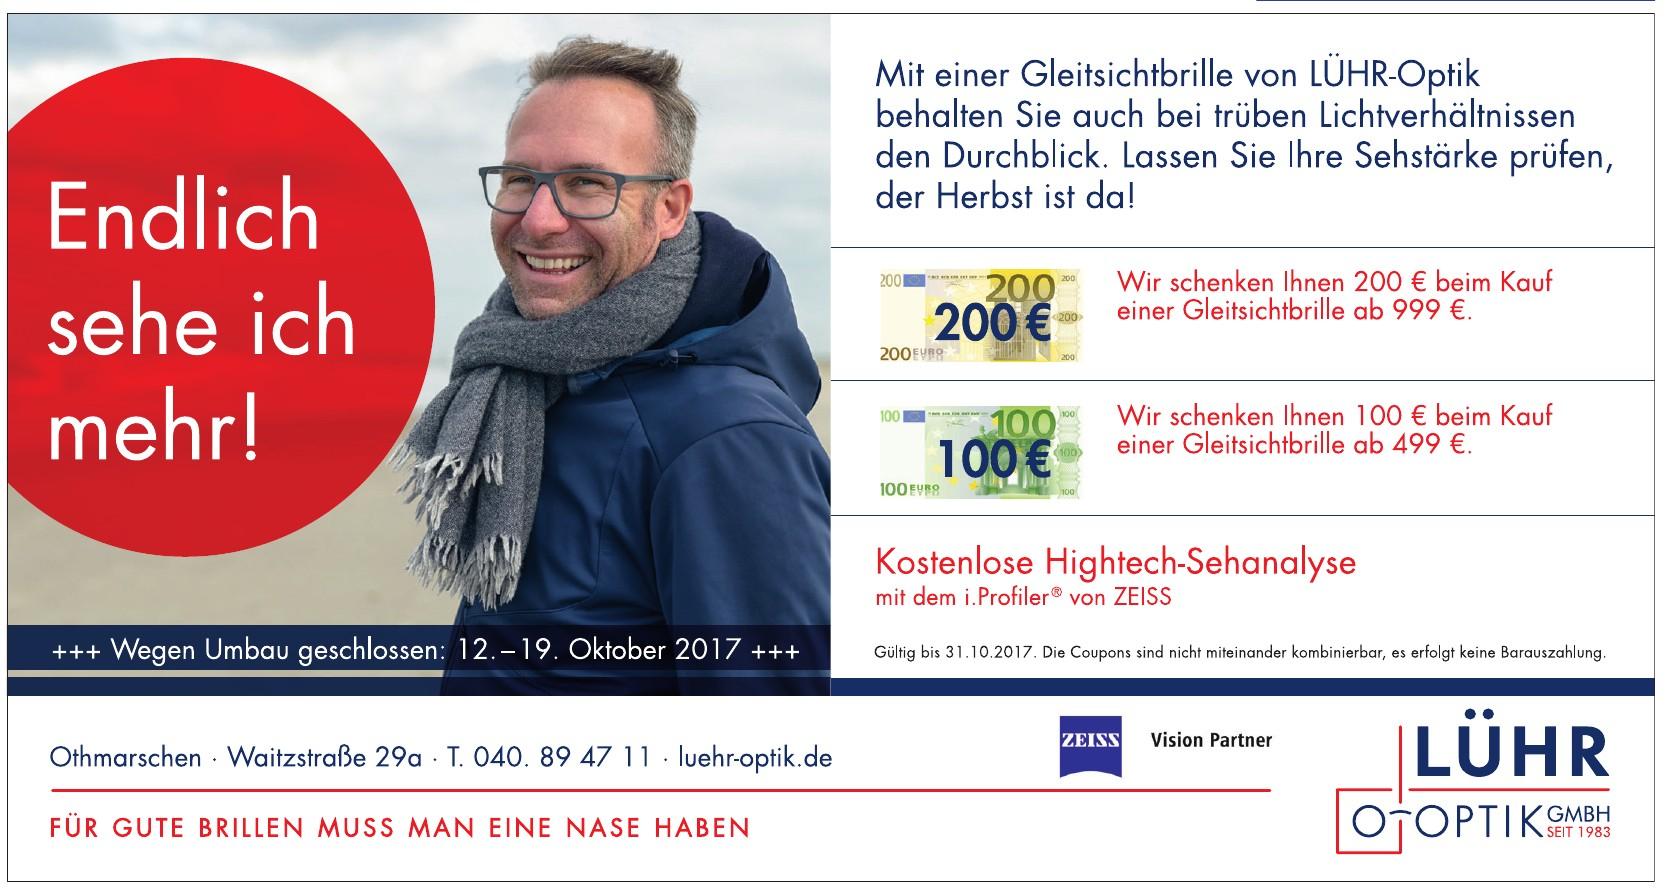 Lühr-Optik GmbH